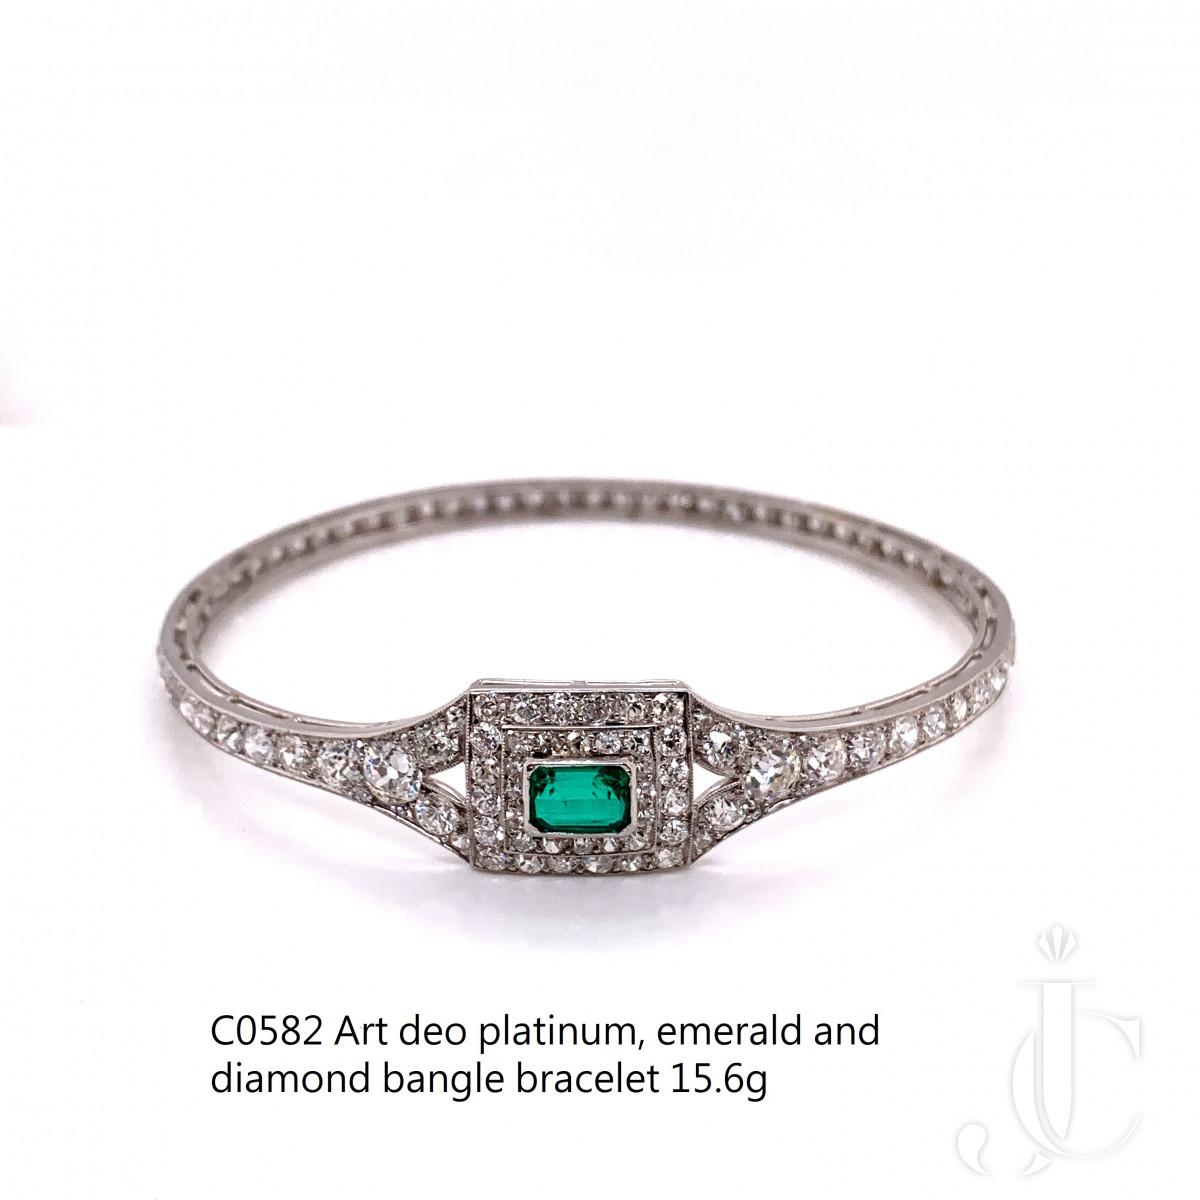 A platinum, emerald and diamond bangle bracelet by Cartier